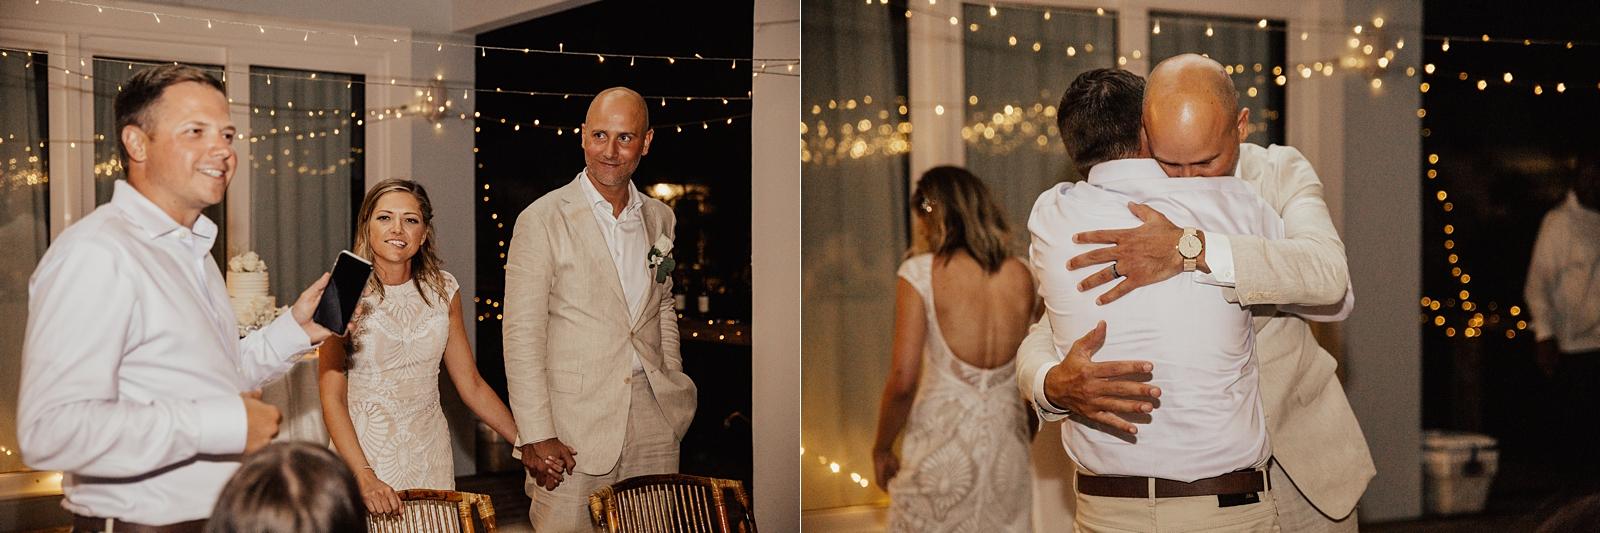 Jenni & Andrew Intimate Beach Destination Wedding in Little Exuma, Bahamas_0538.jpg